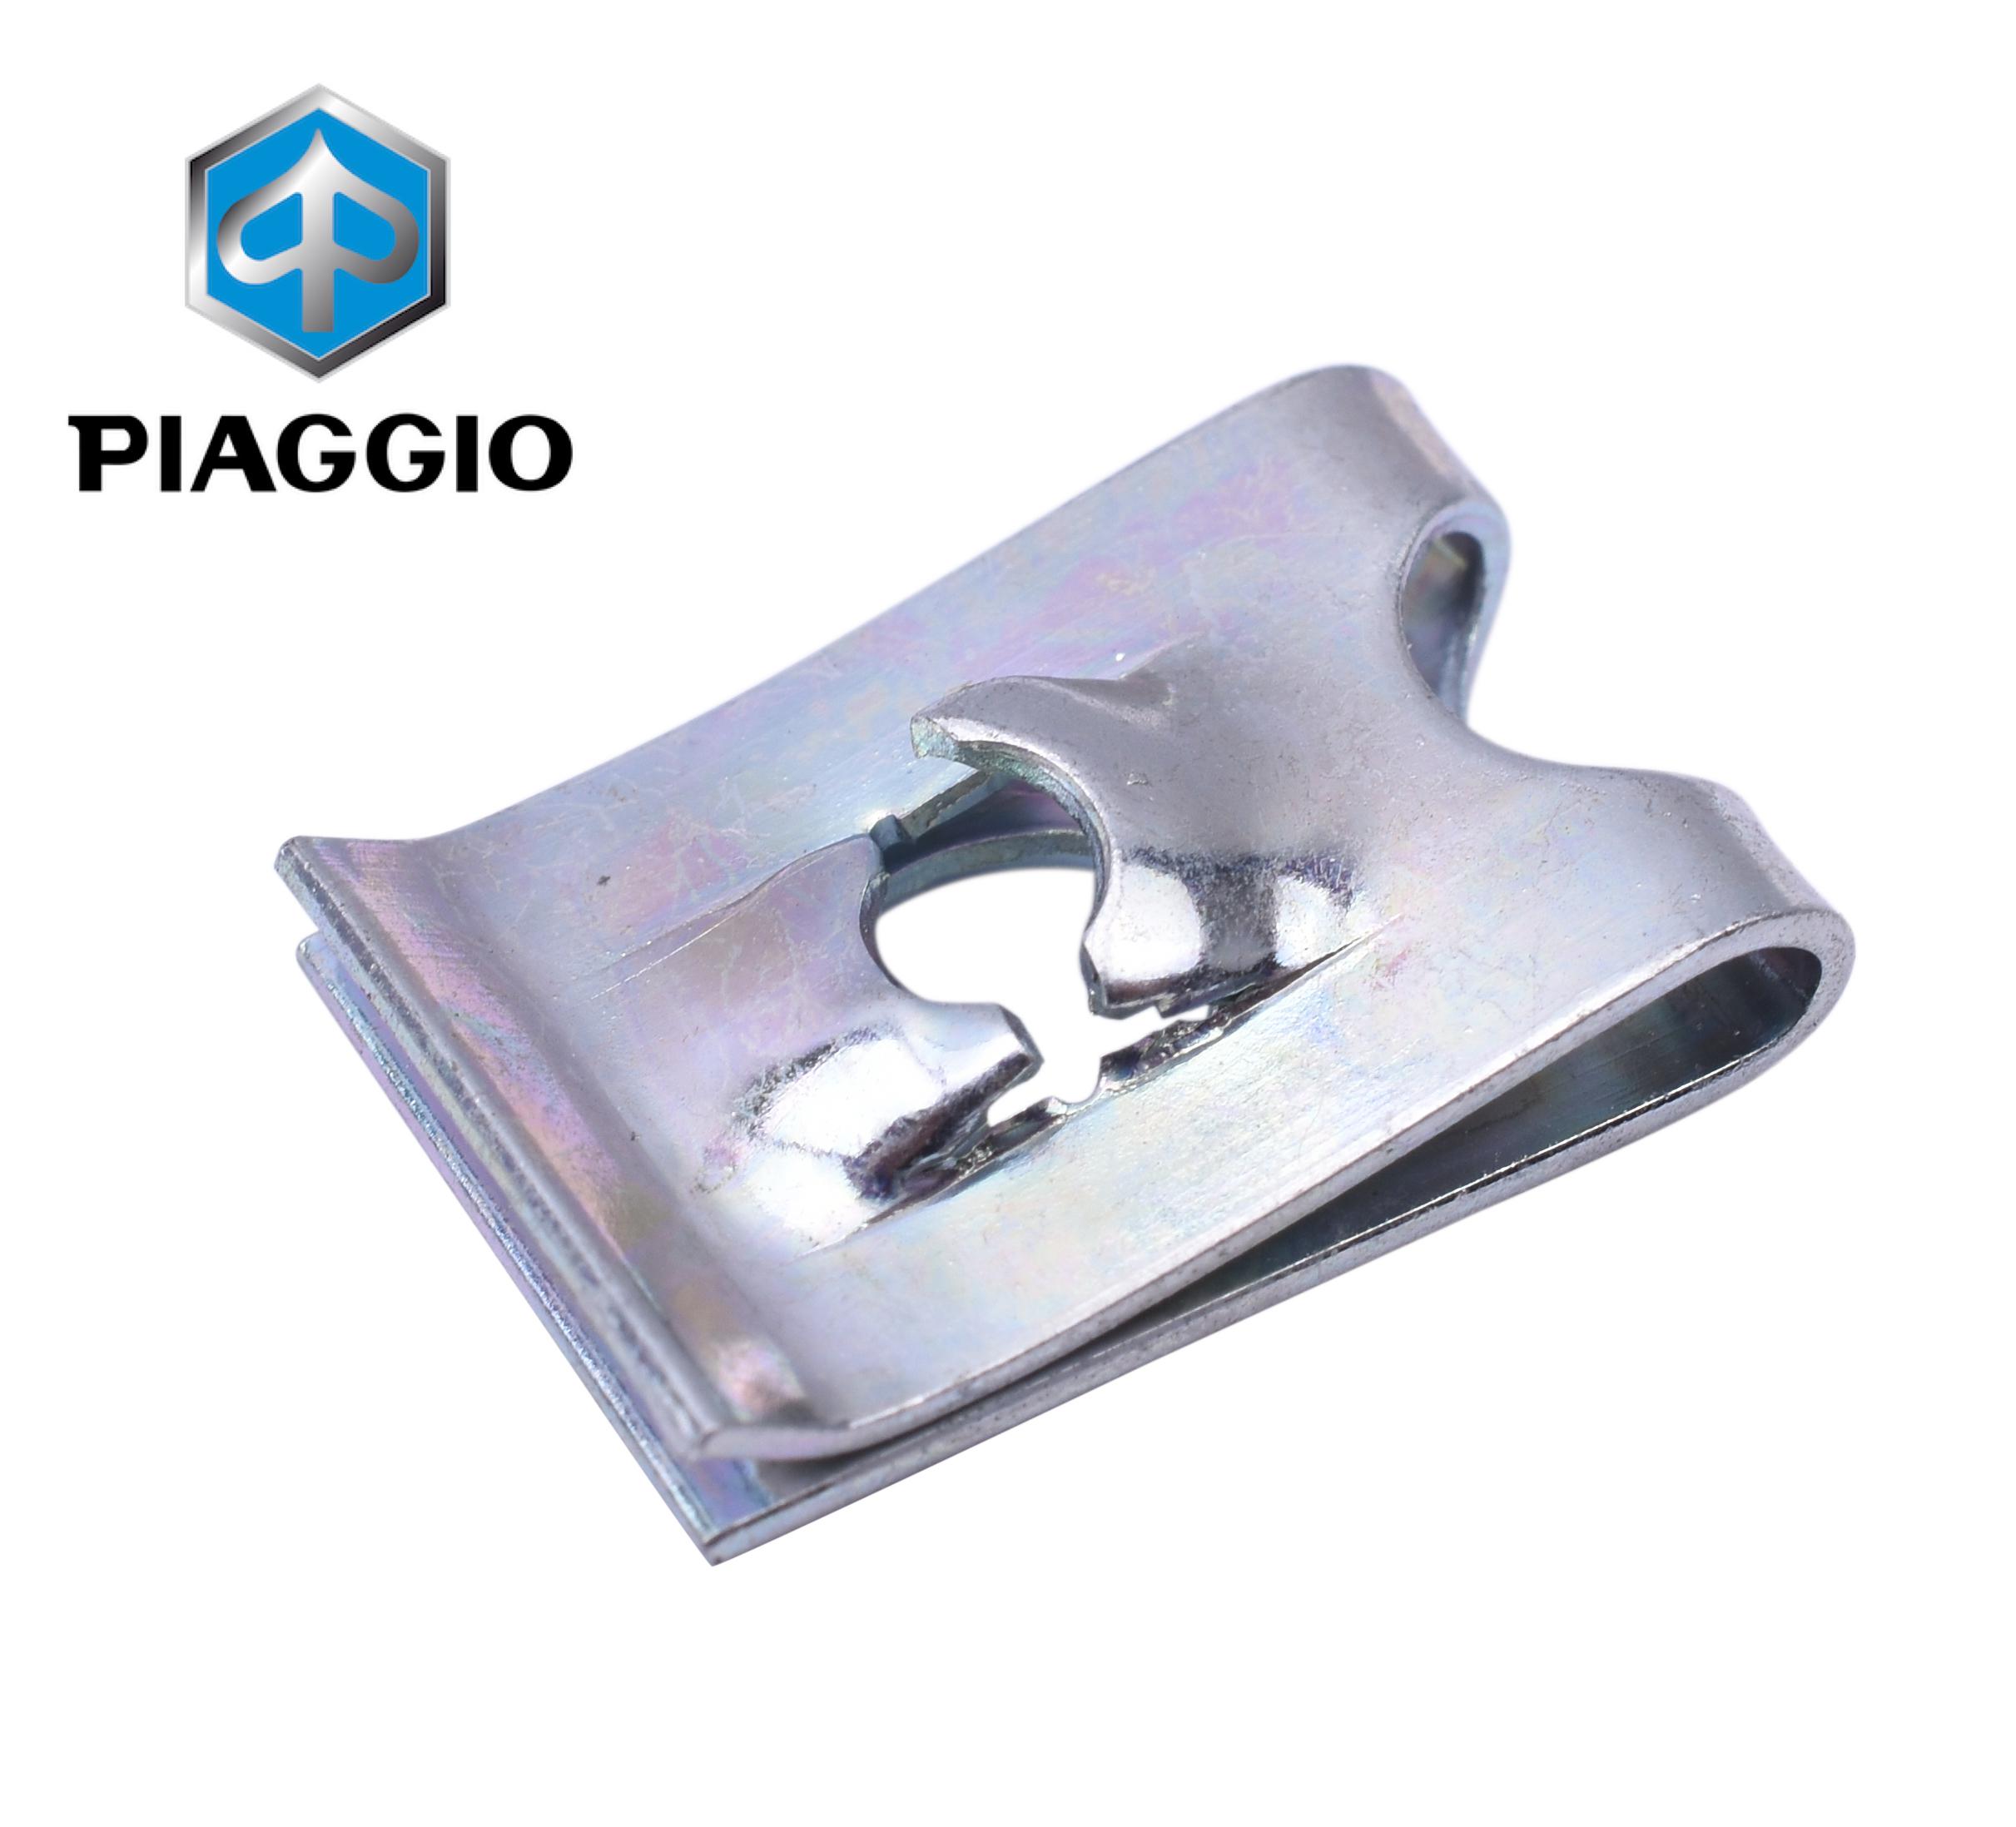 Speednut OEM 11x6,5mm | Piaggio / Vespa